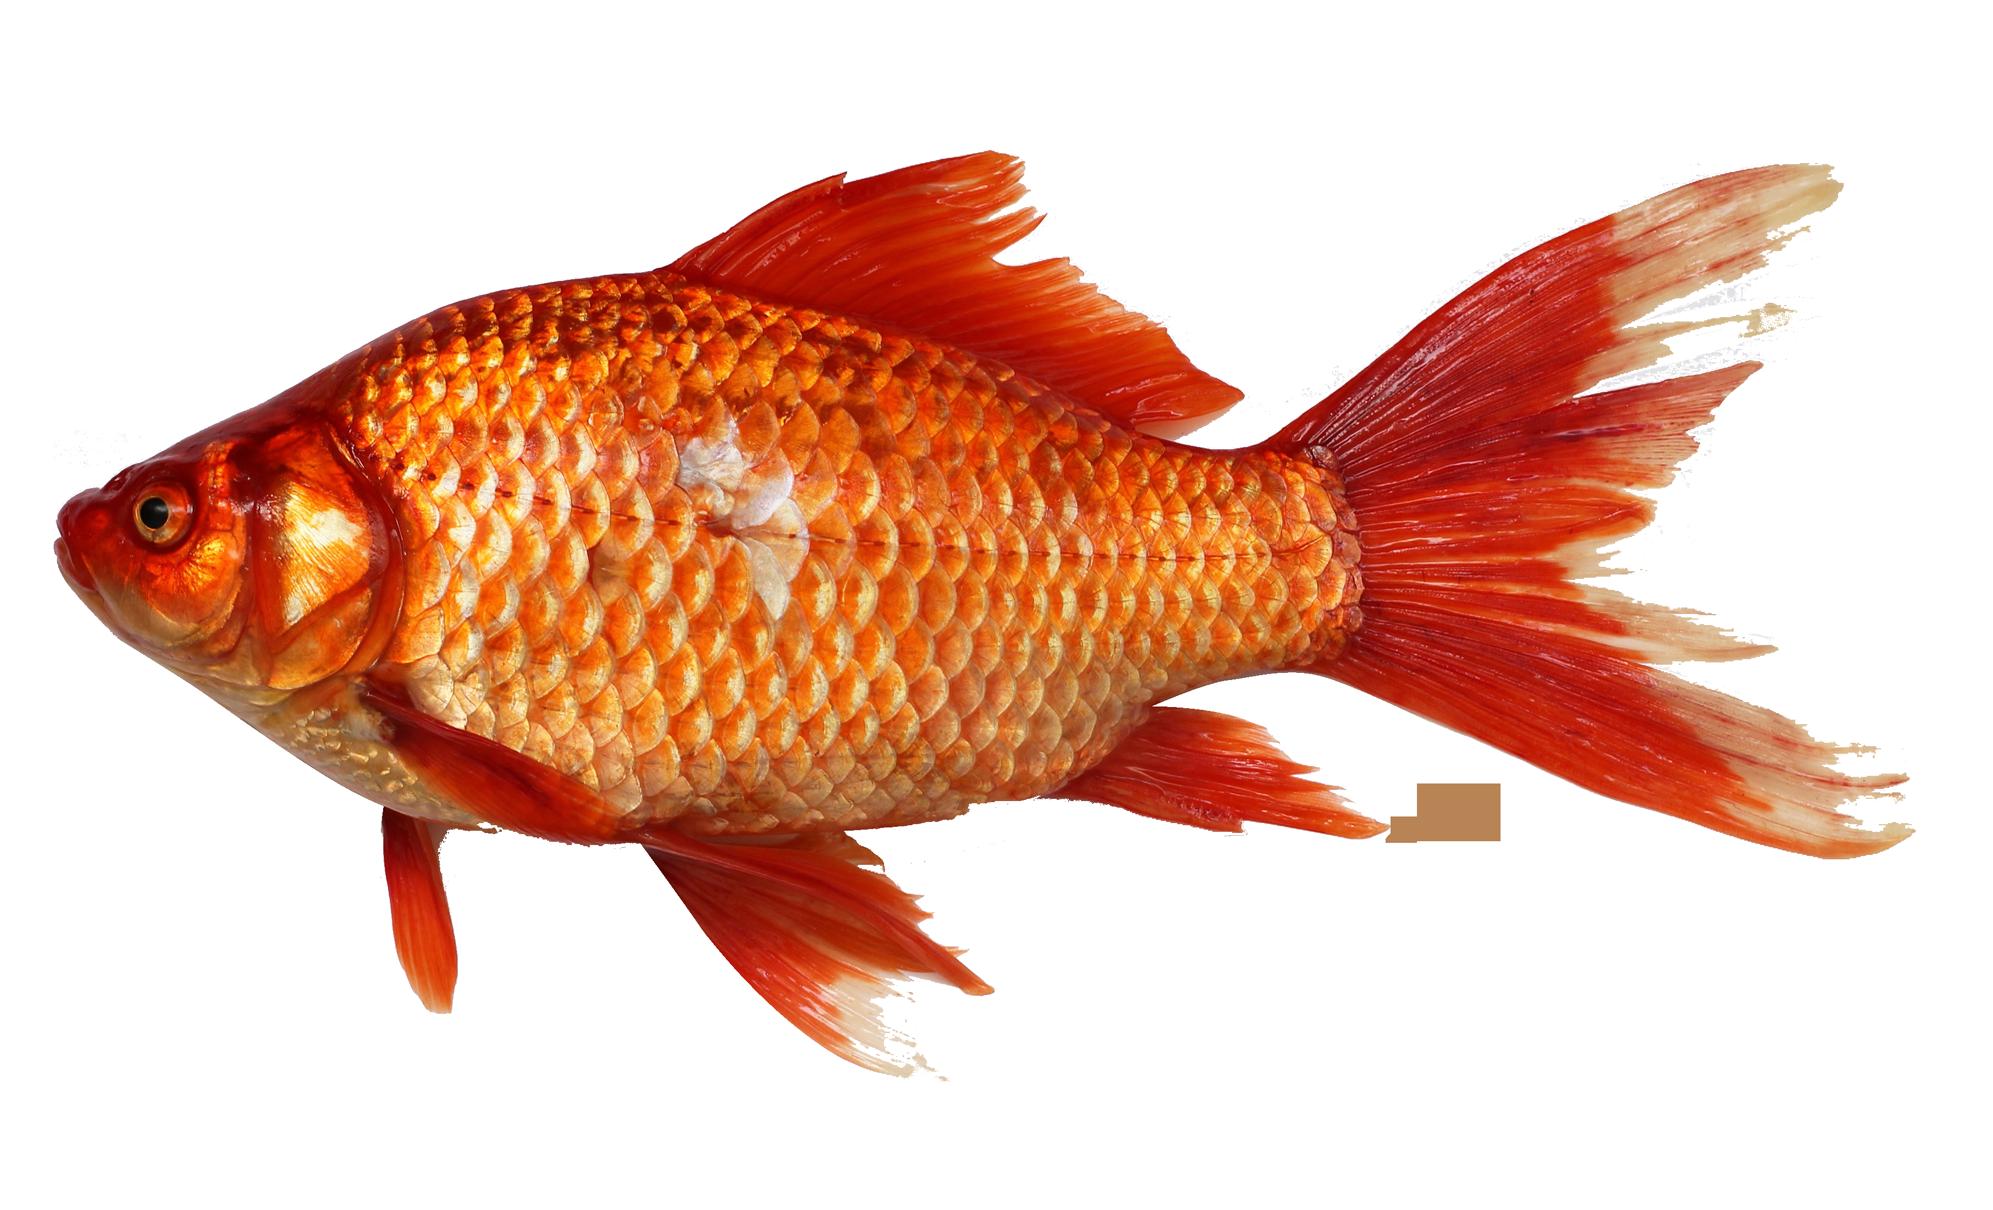 Goldfish Png Image Fish Clipart Koi Fish Drawing Goldfish